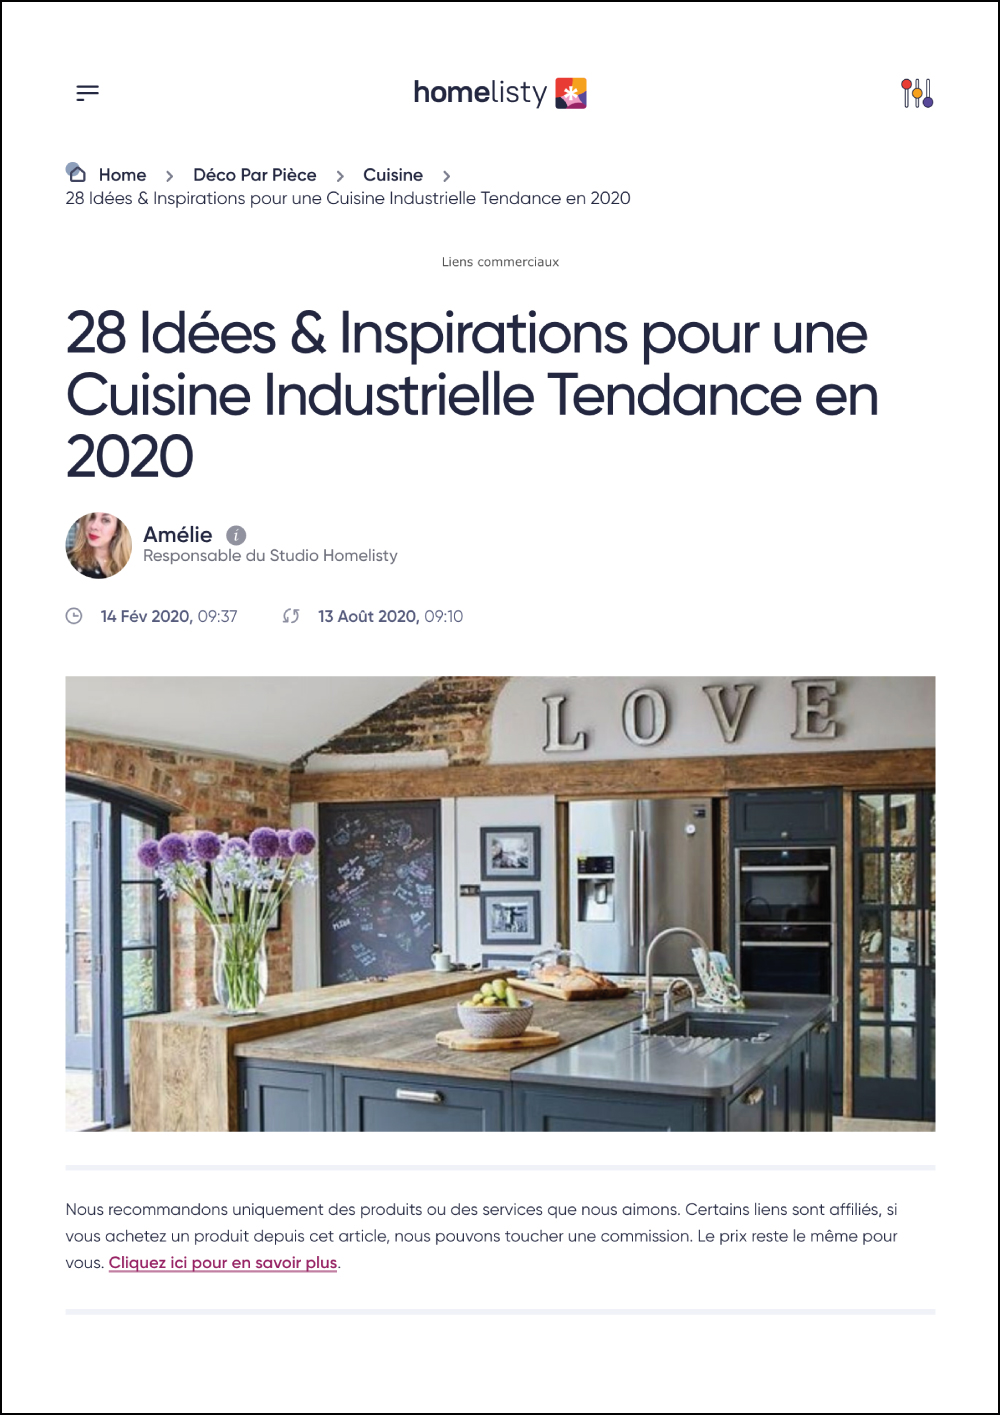 Homelisty Online Magazine